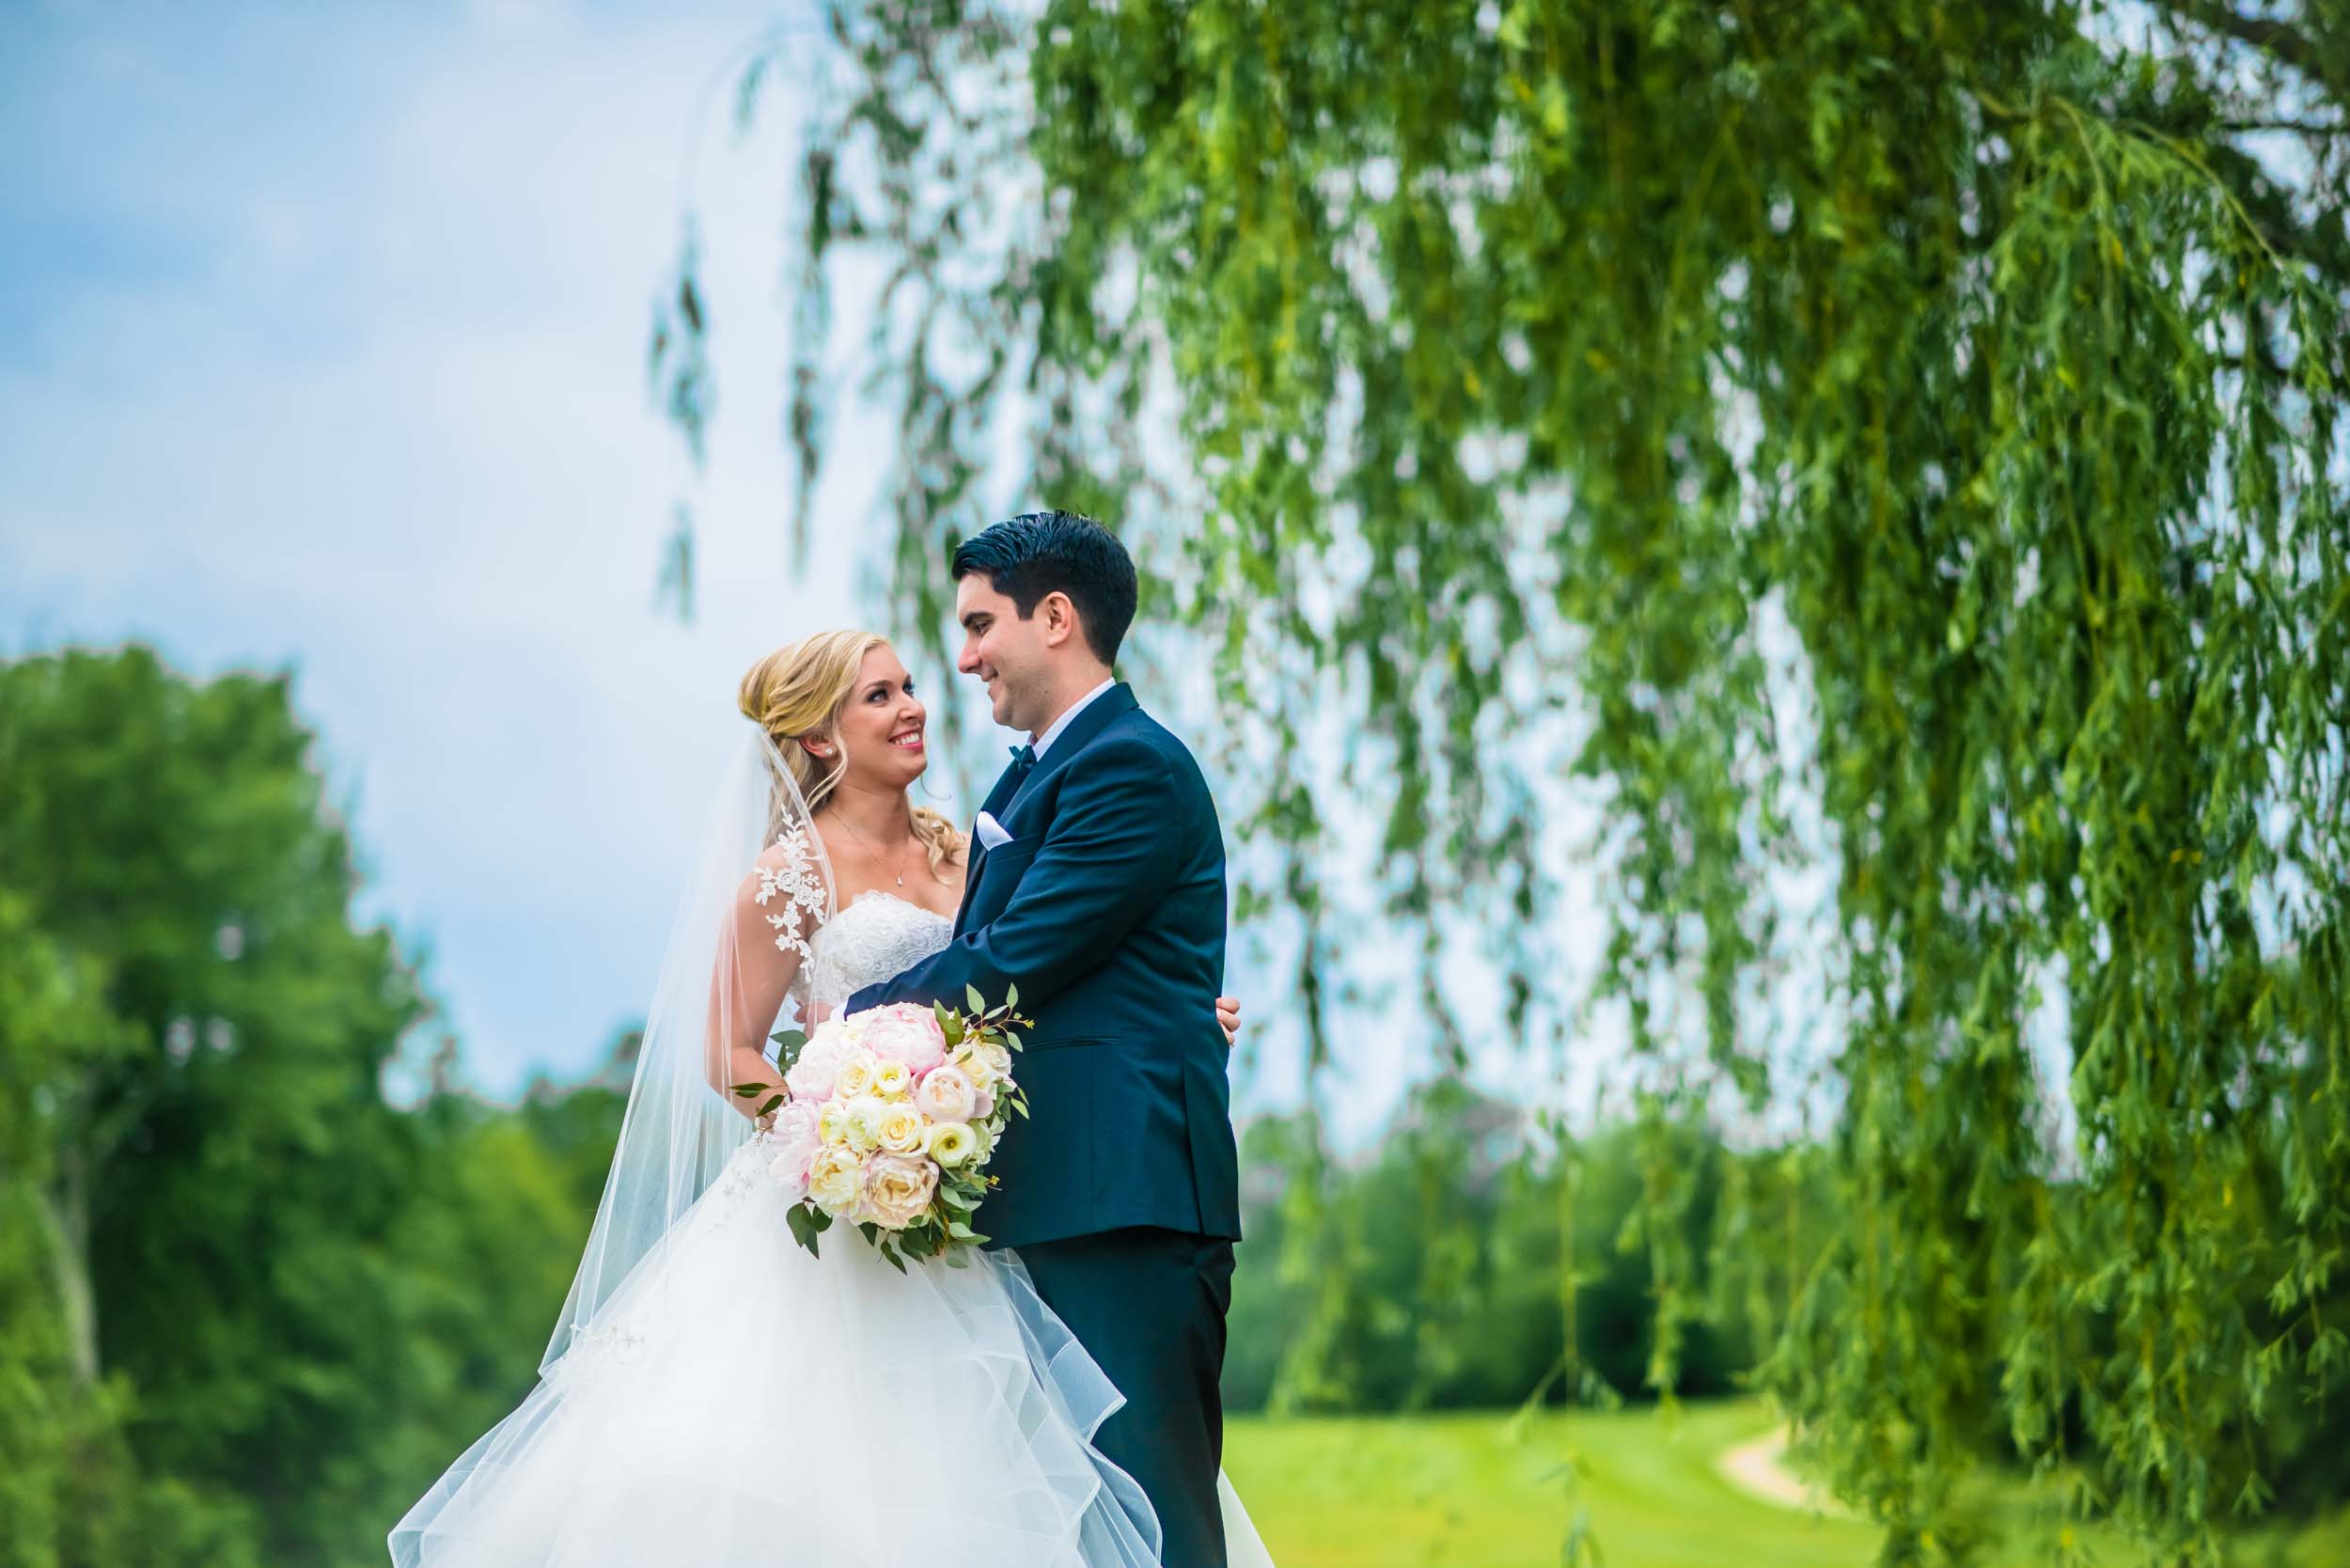 dc+metro+wedding+photographer+vadym+guliuk+photography+wedding+bride+and+groom-2068.jpg